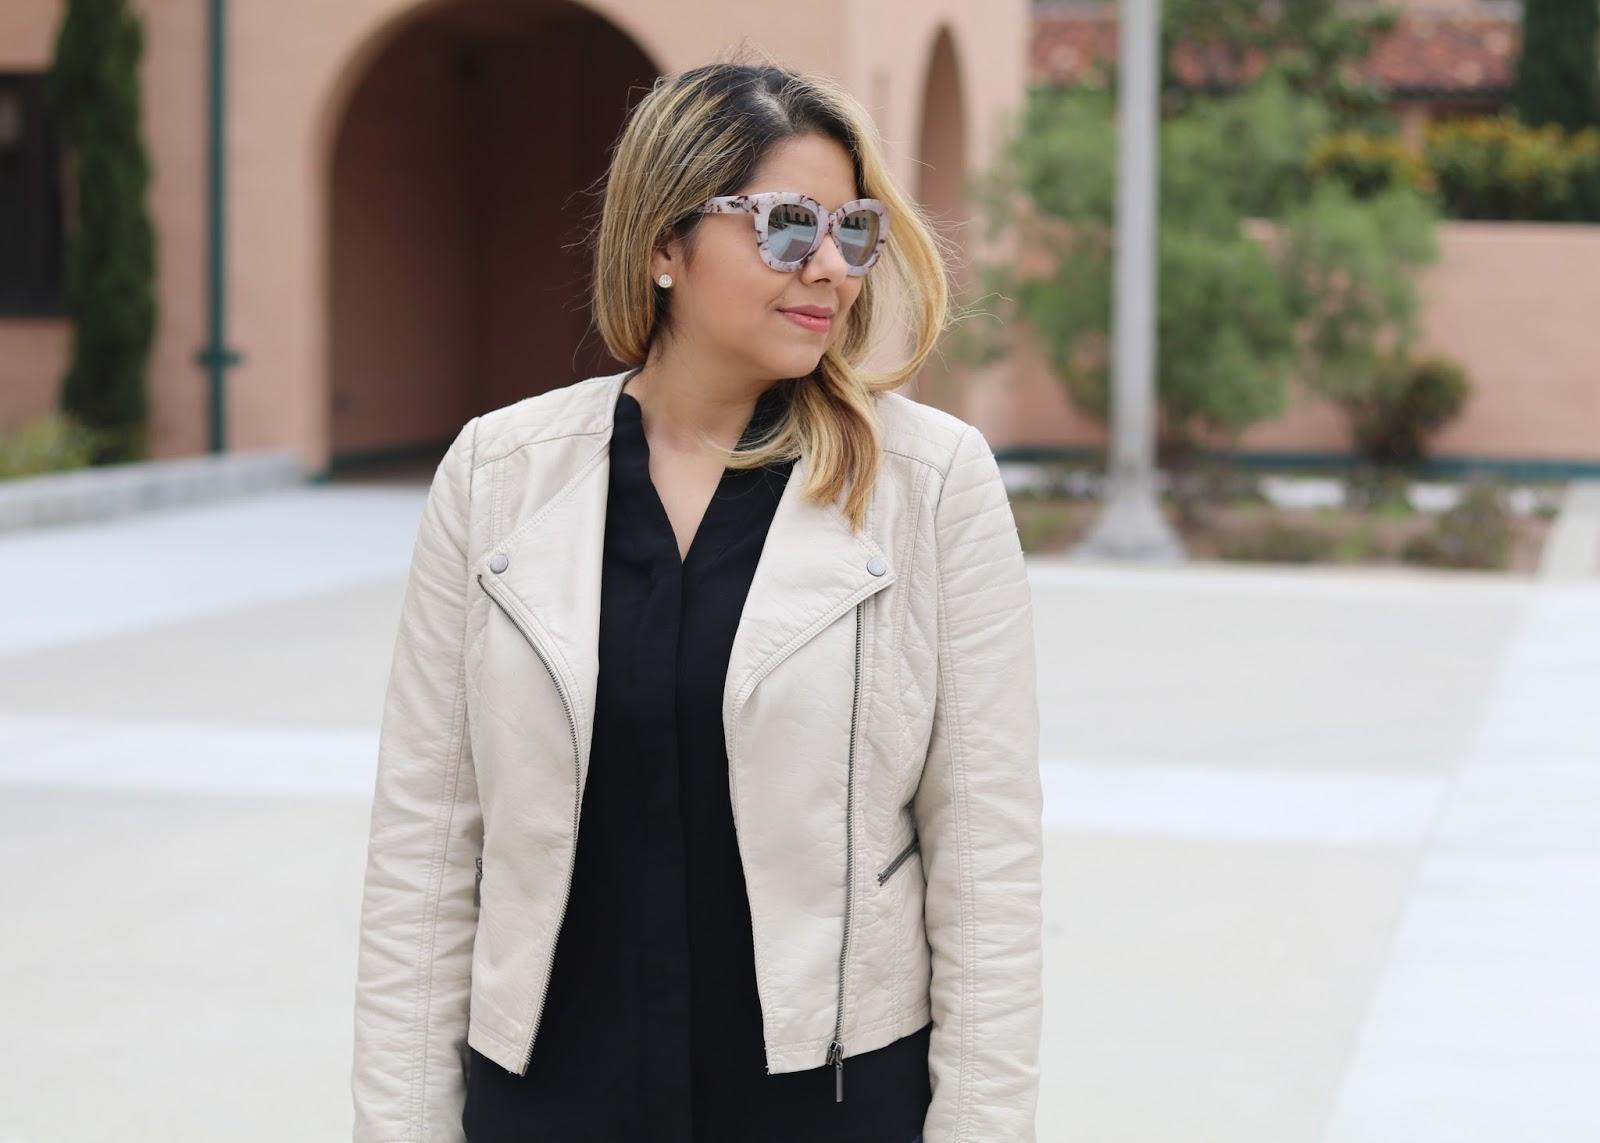 latina fashion blogger, beige jacket outfit, quay australia sunglasses, quay blogger, quay squad